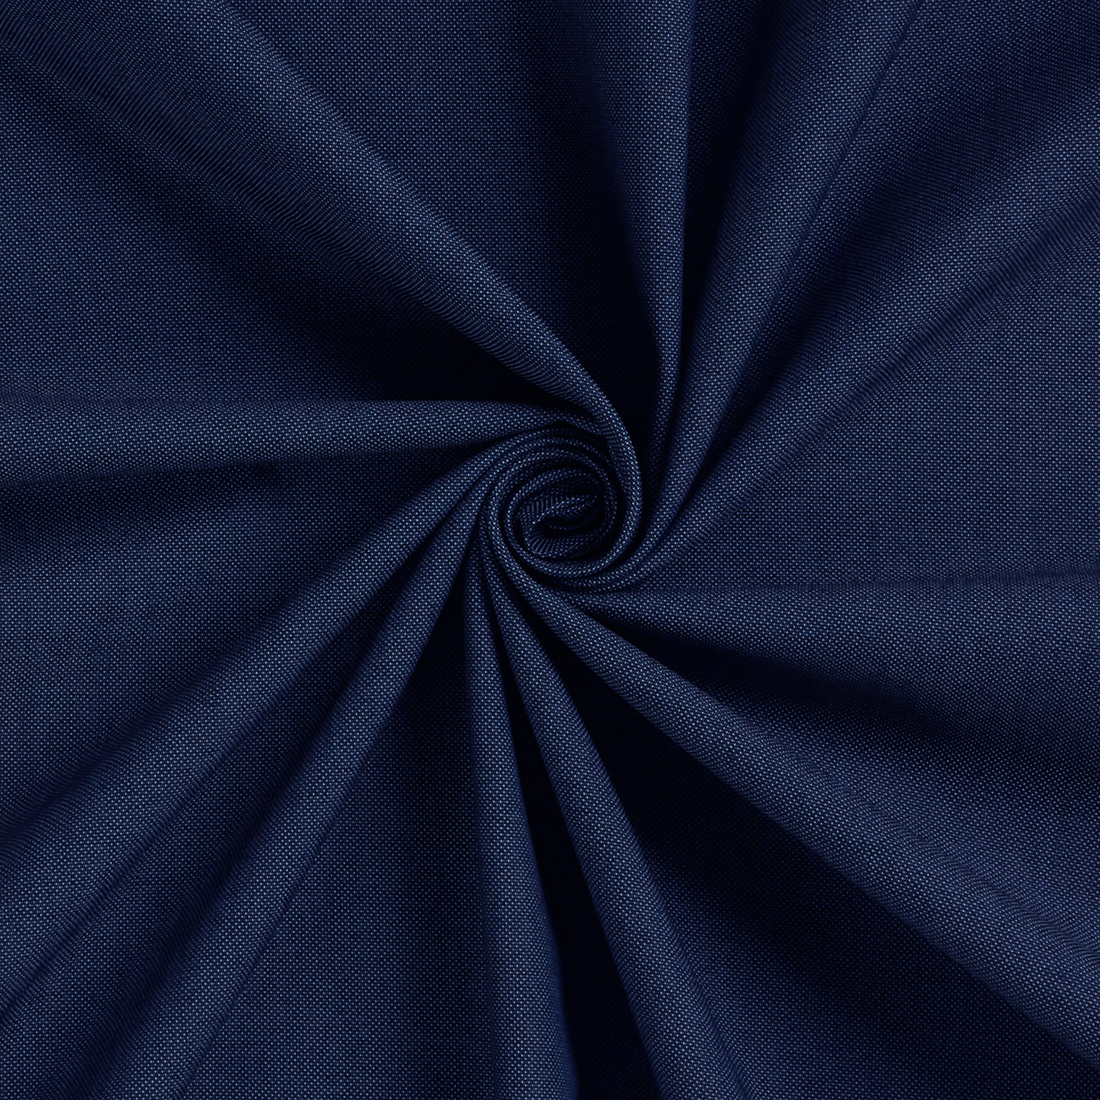 Chambray Stretch Blue Dress Fabric